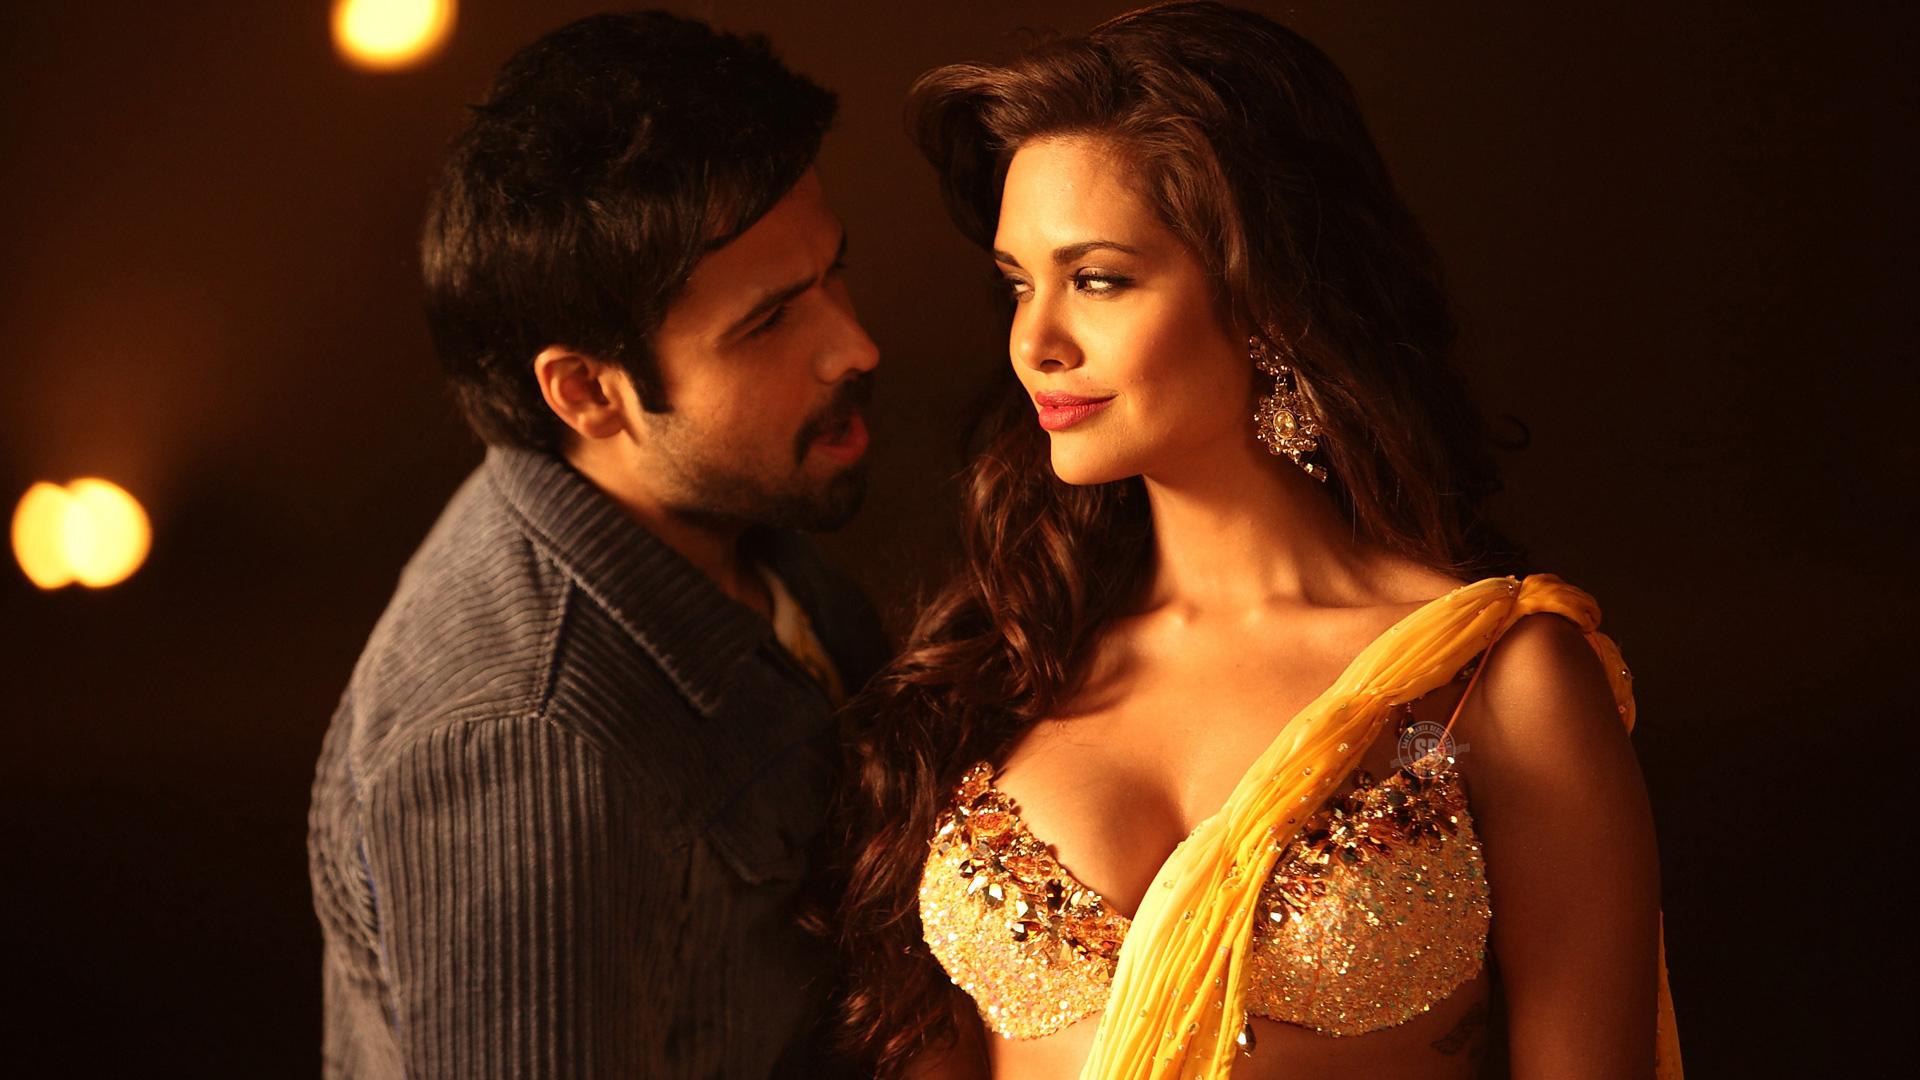 Jannat 2 Dialogues - Movie Still - Romantic Emraan Hashmi and Esha Gupta